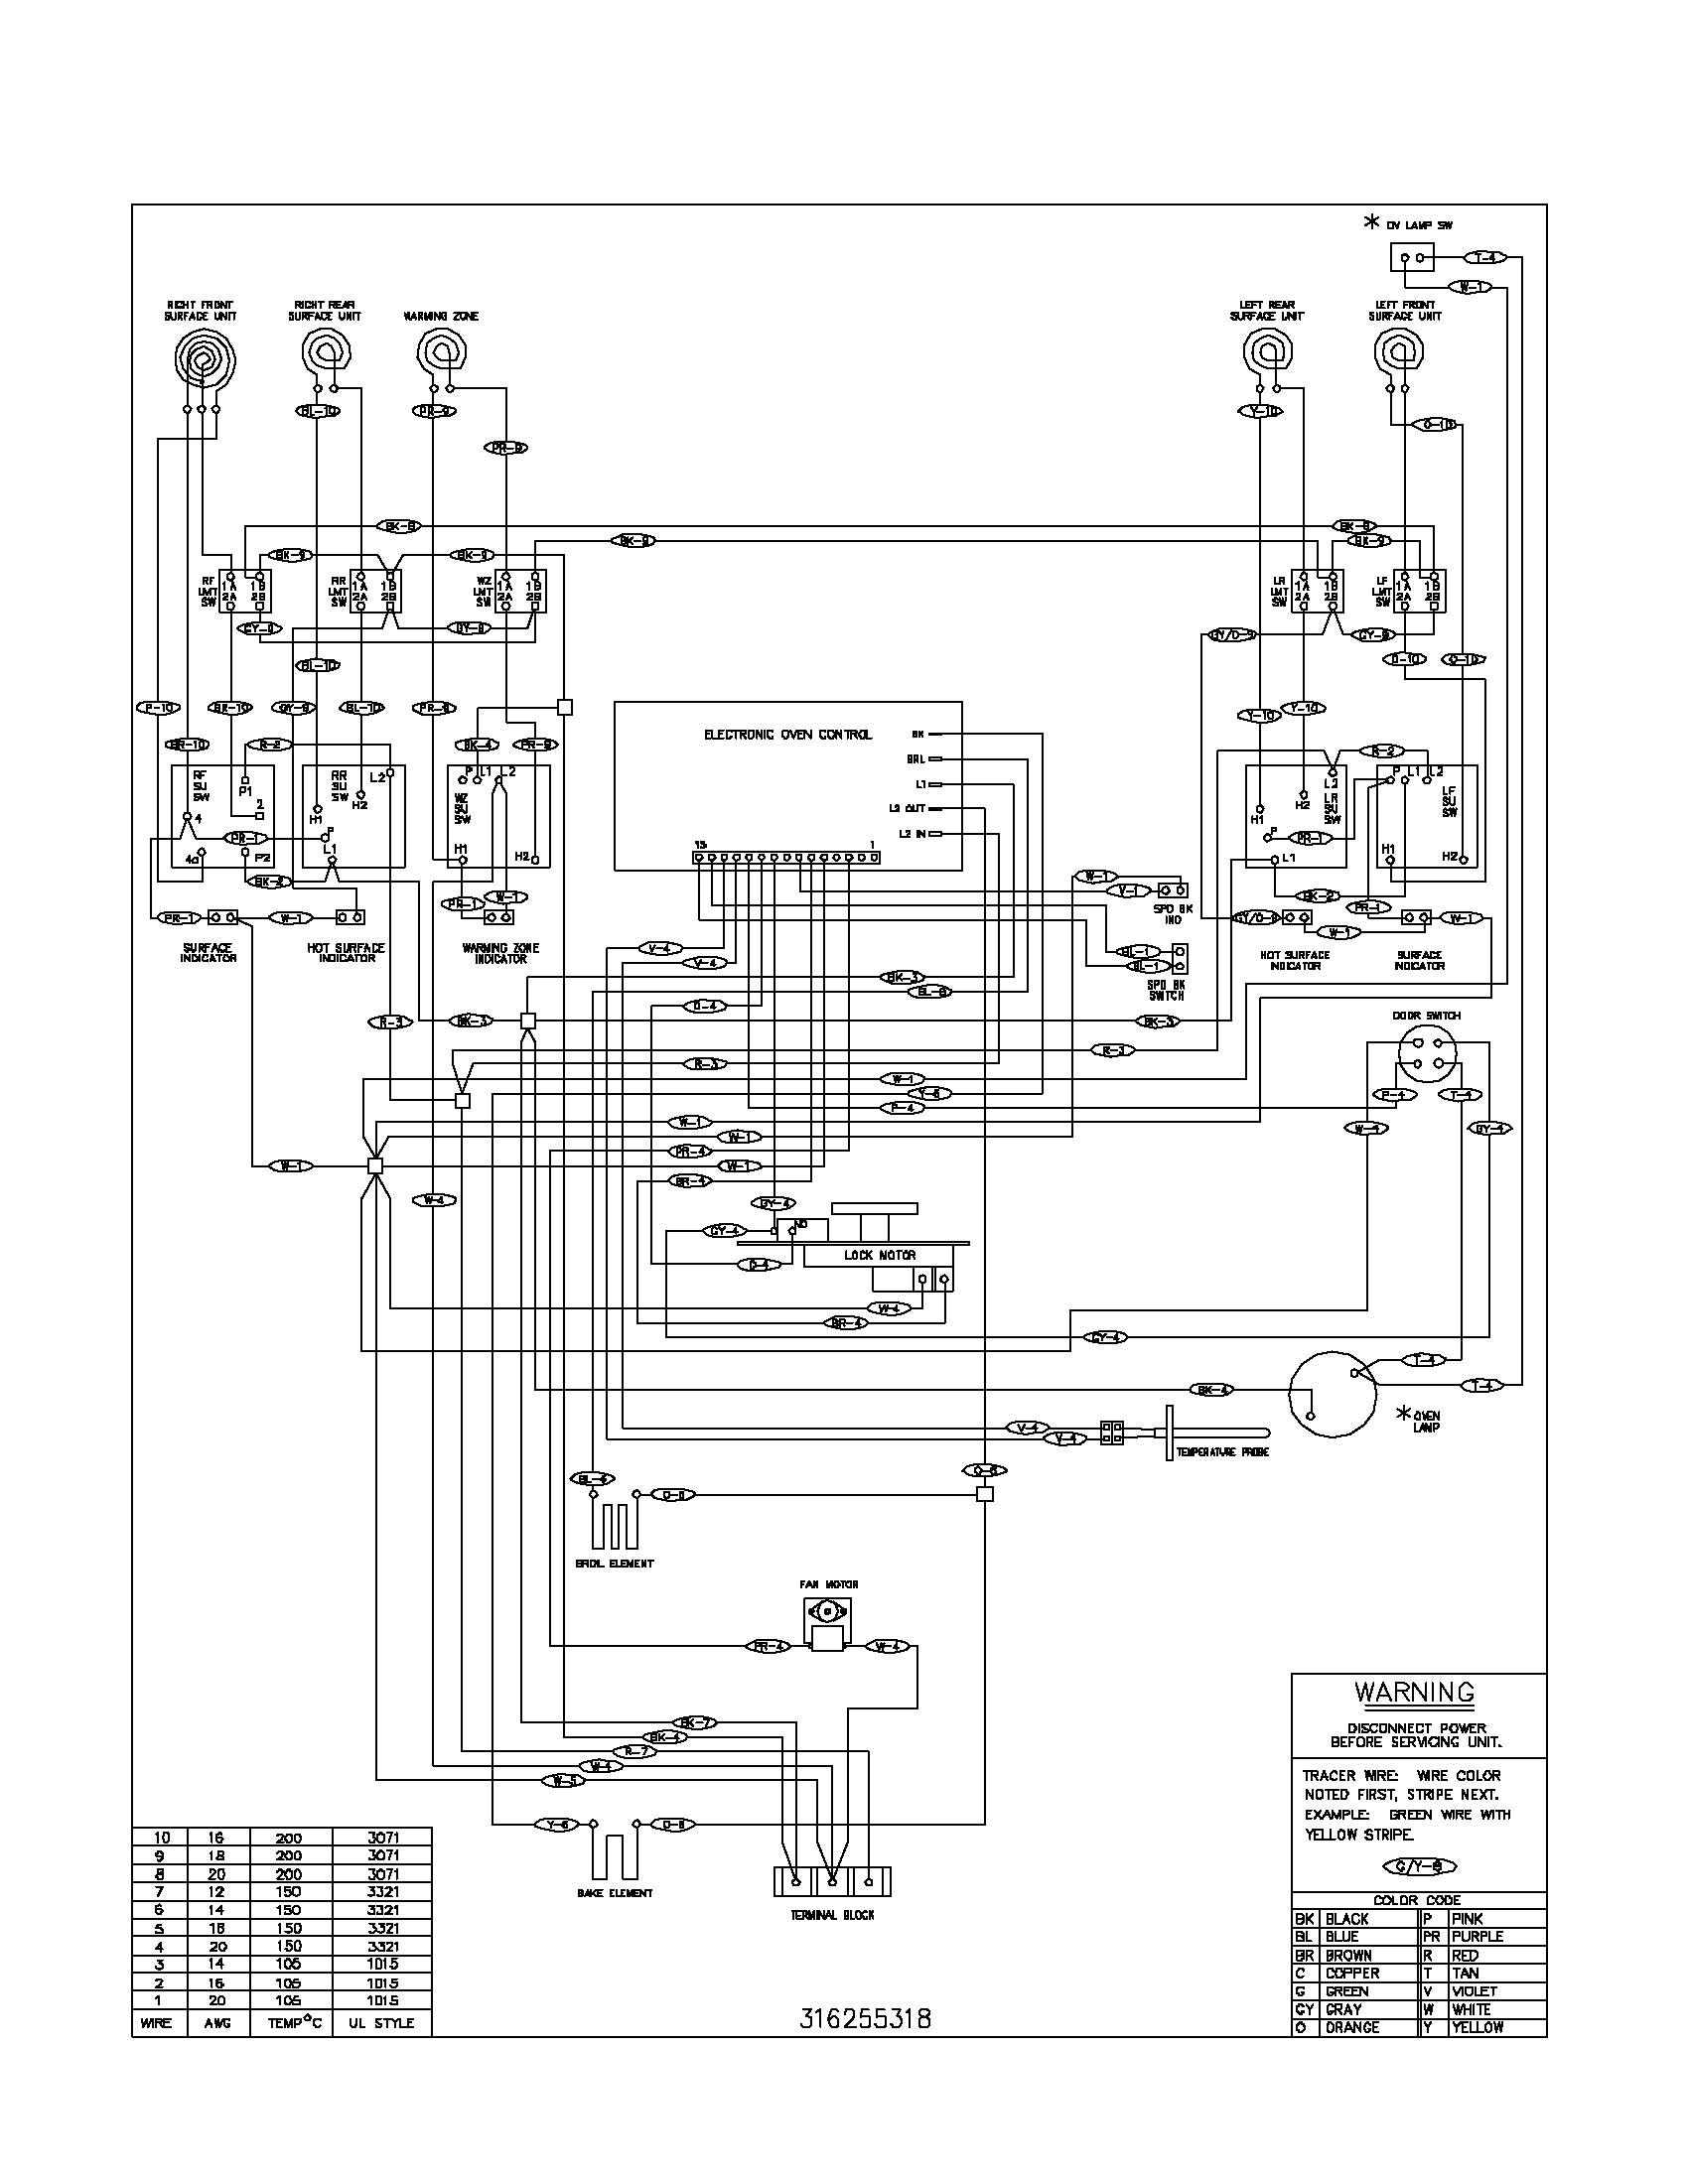 oven control wiring wiring diagram schematic